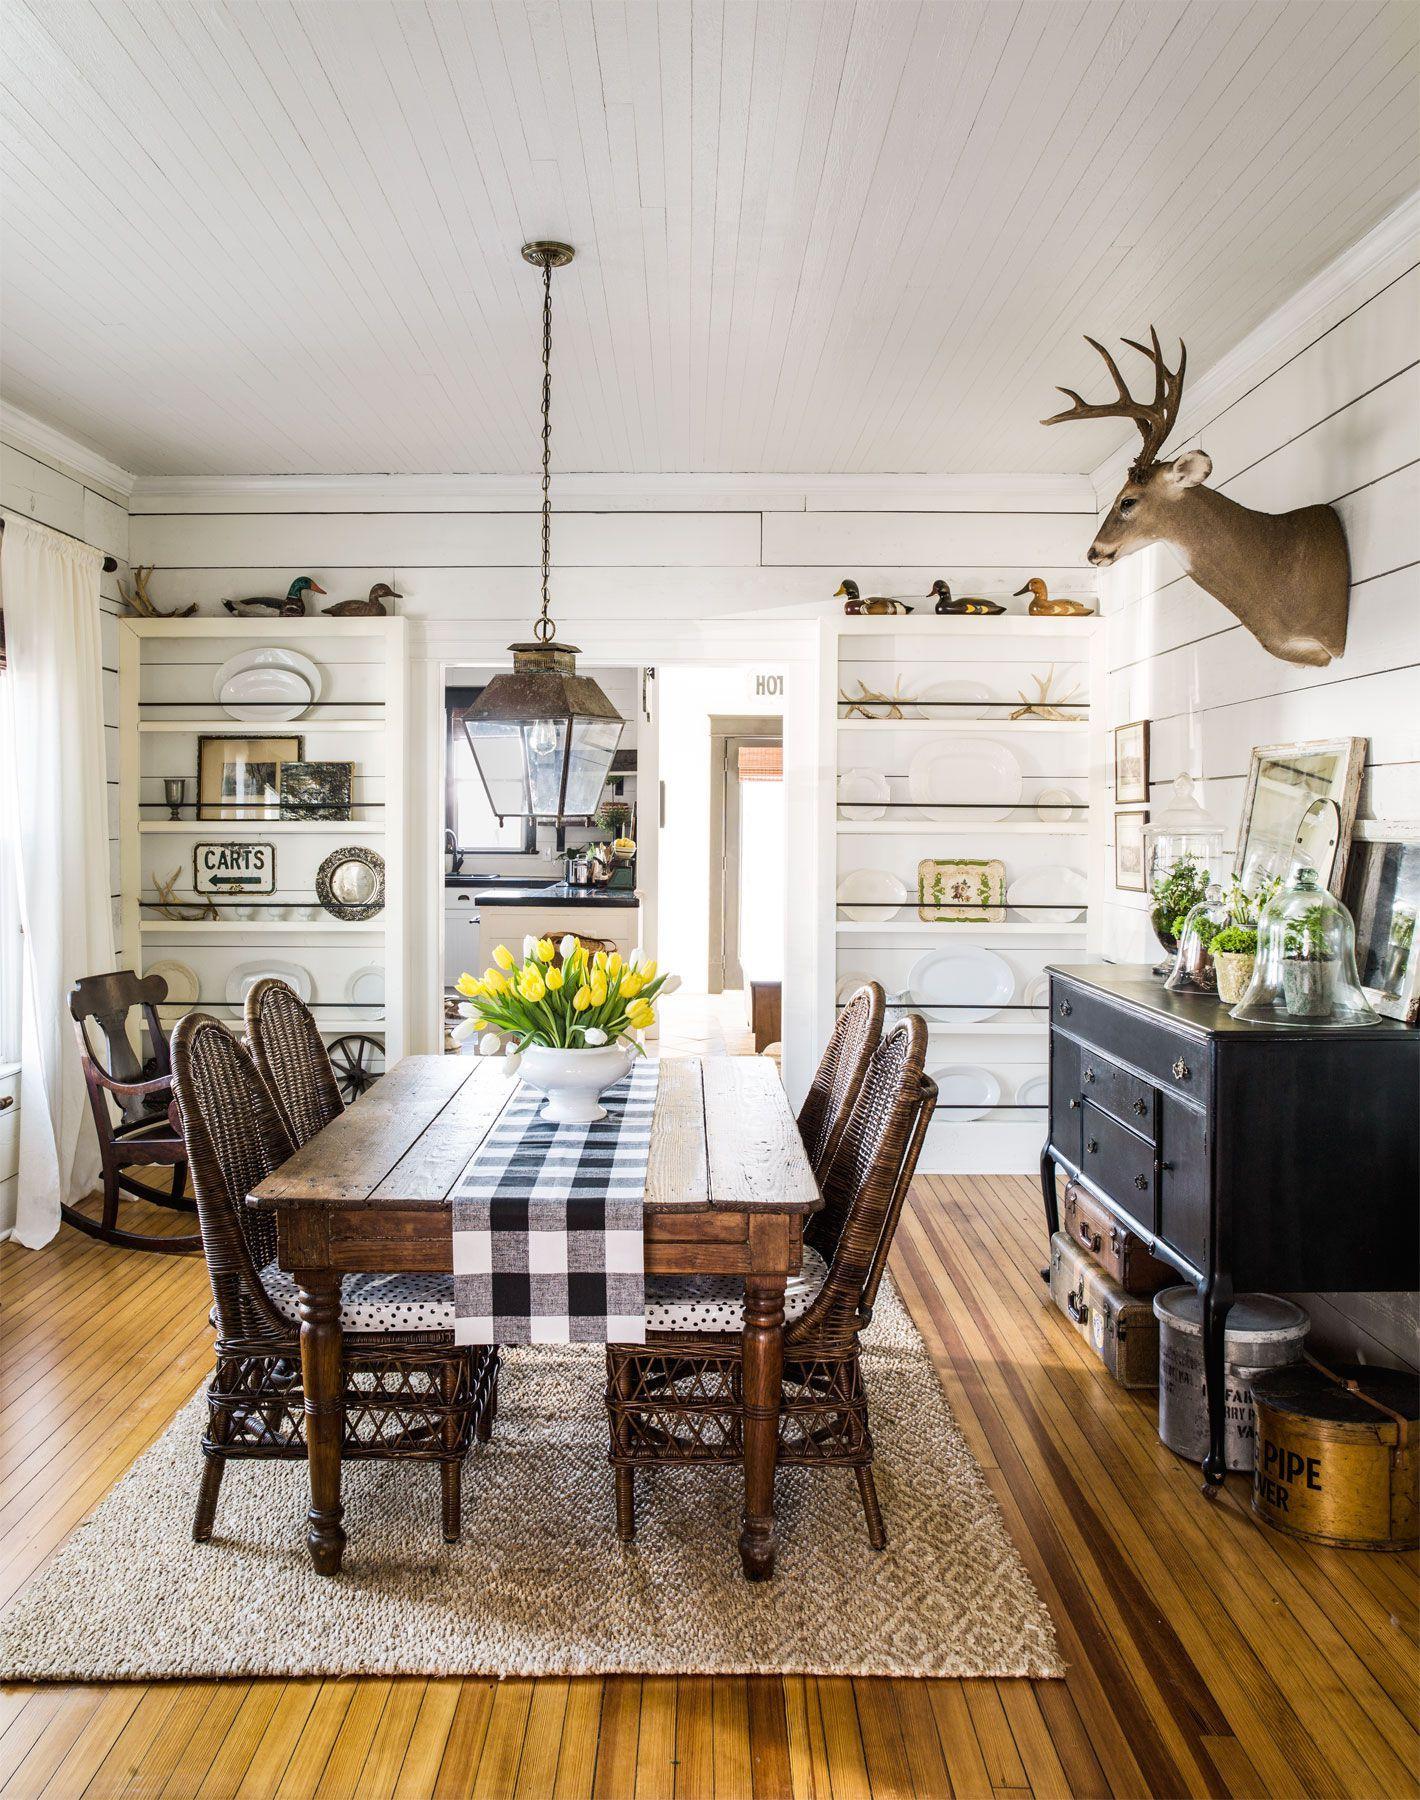 18 vintage decorating ideas from a 1934 farmhouse rustic rh pinterest com